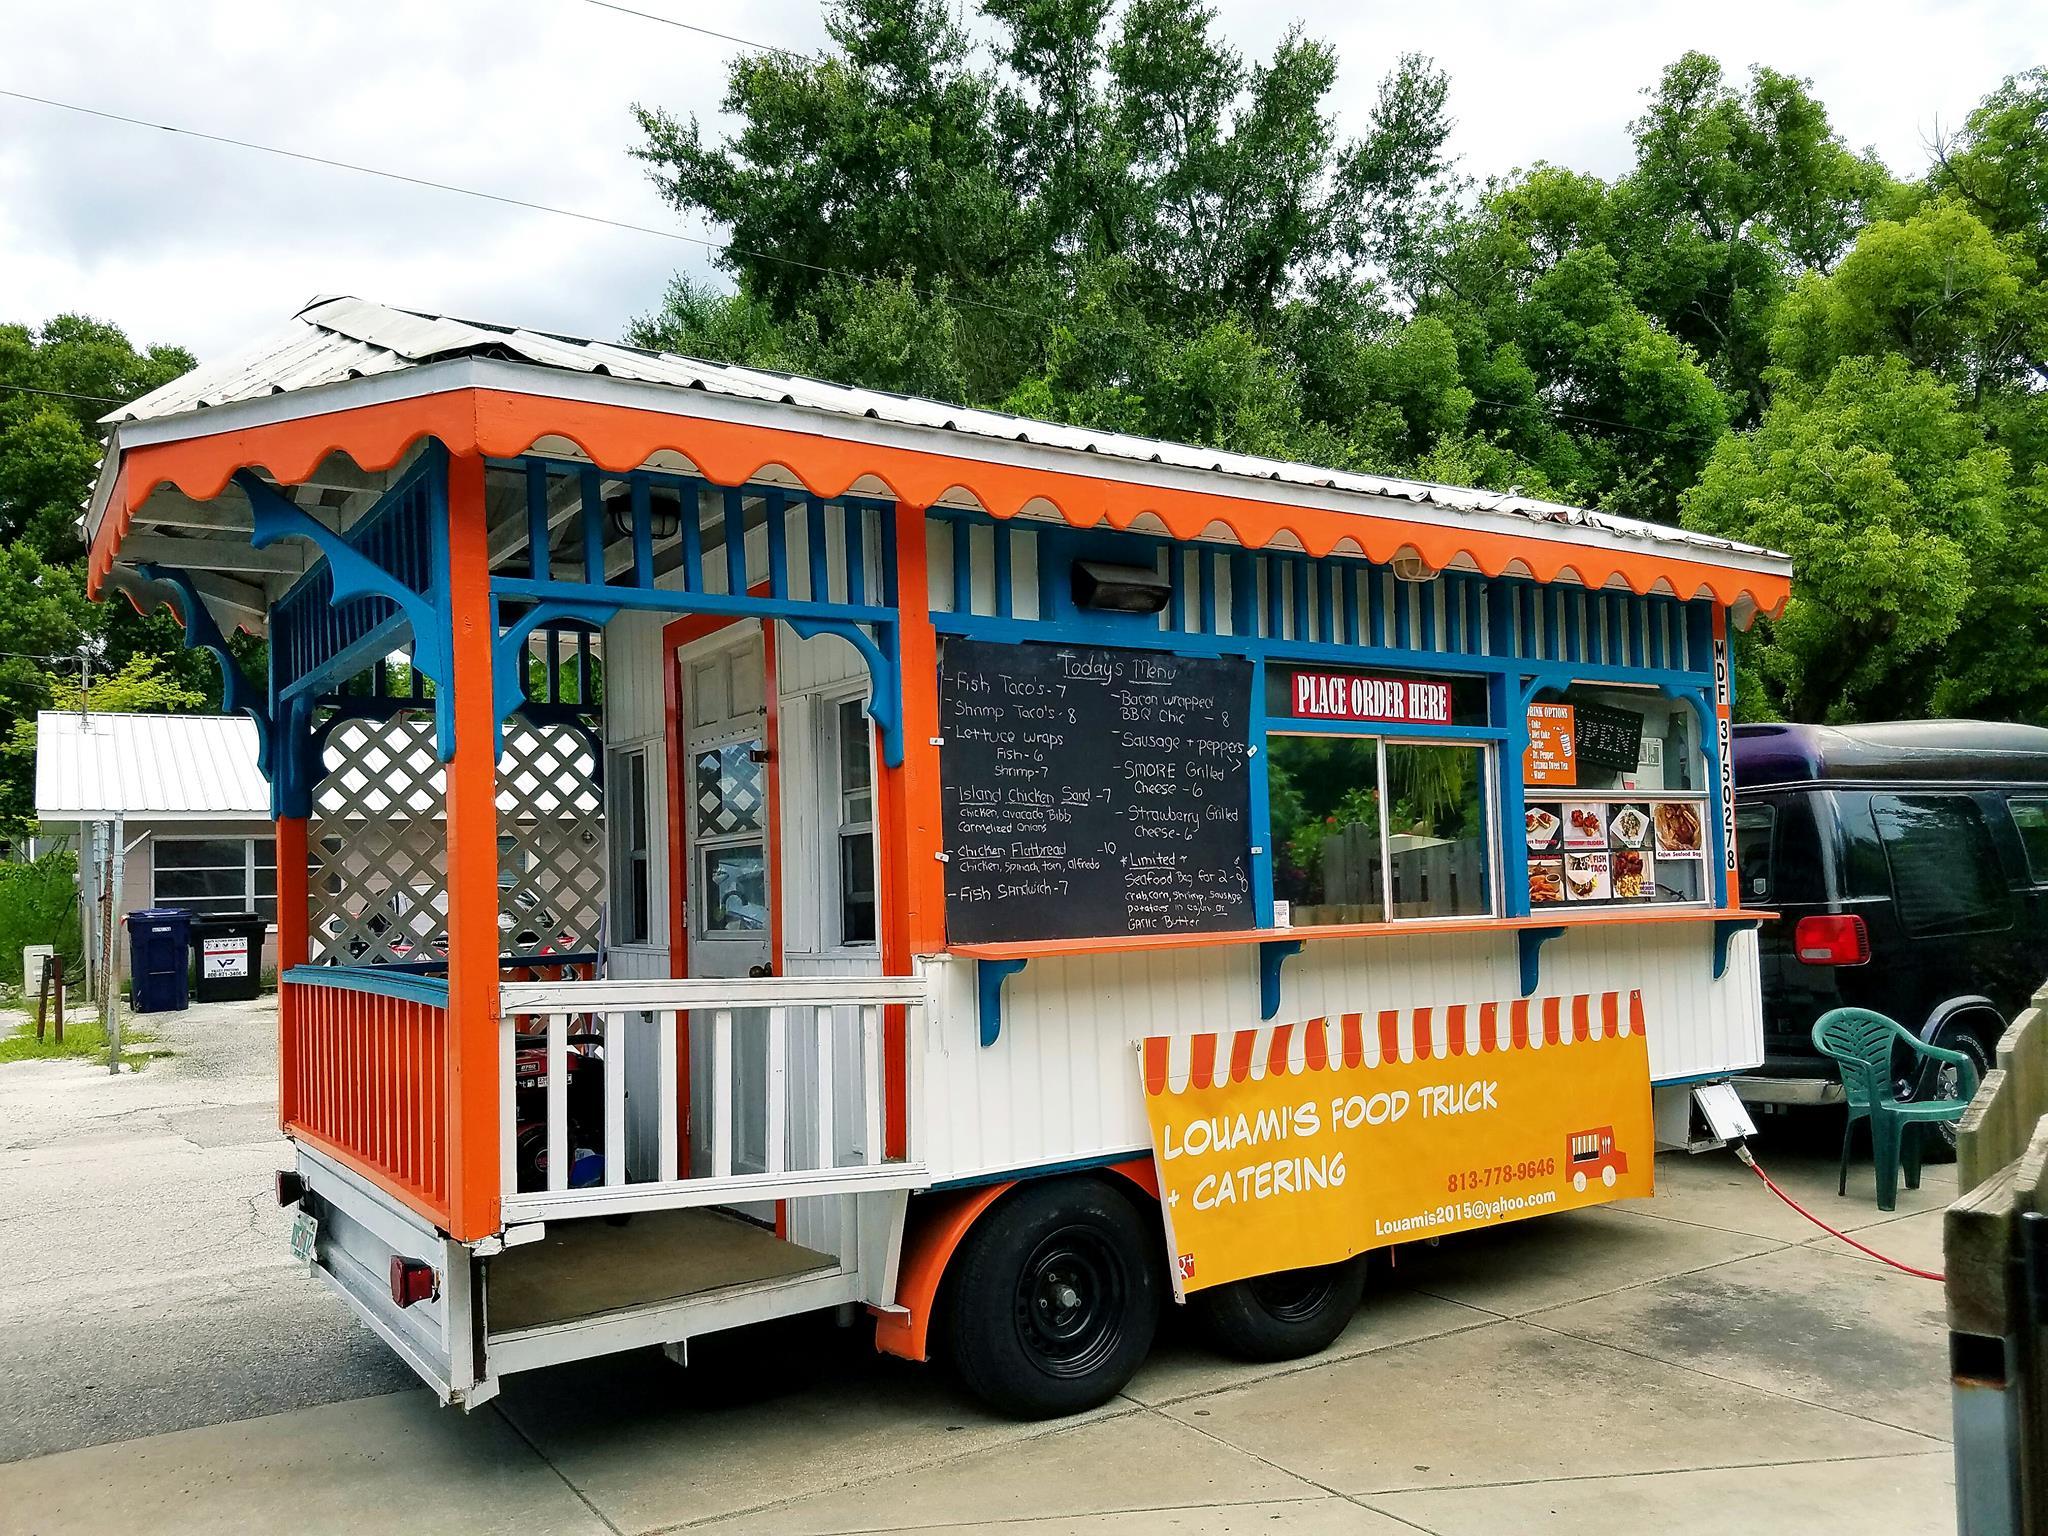 Louami's Food Truck